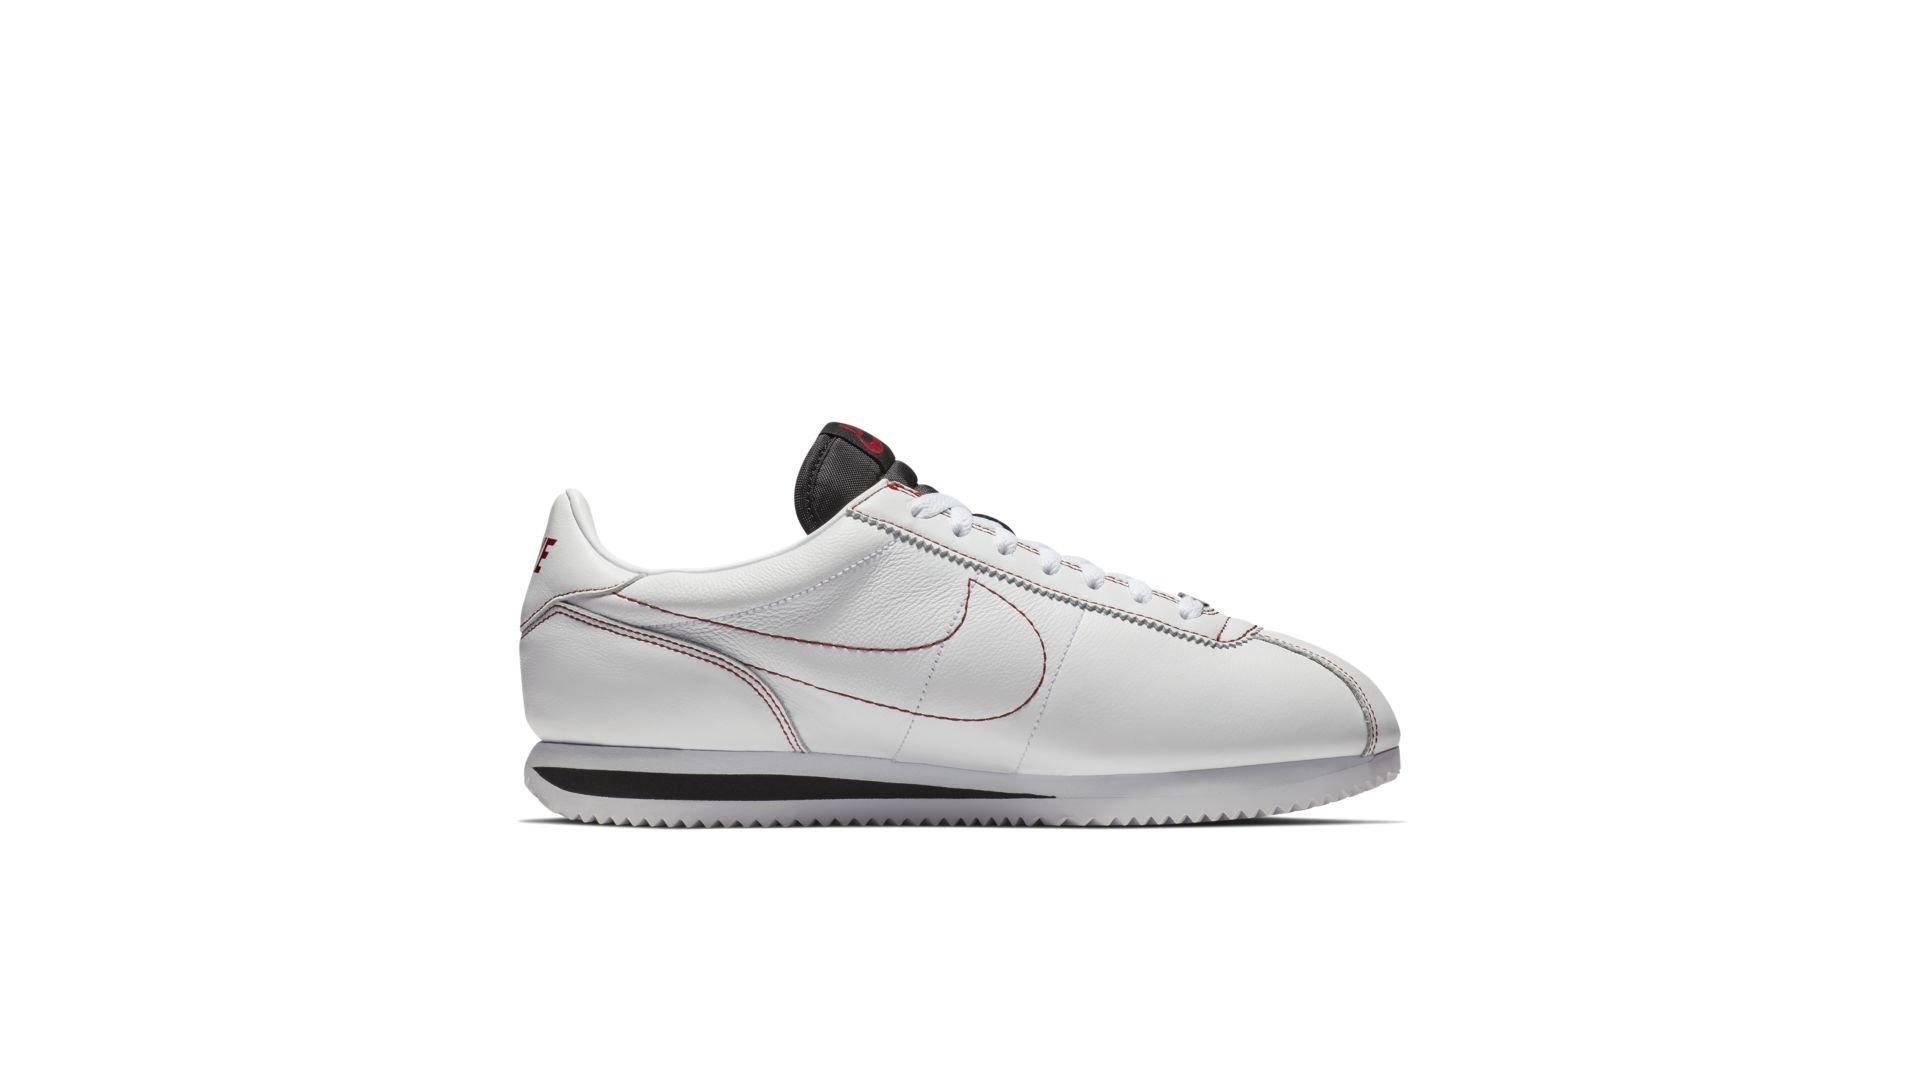 Nike Cortez Kenny 1 Kendrick Lamar Damn White Gym Red (AV8255-106)